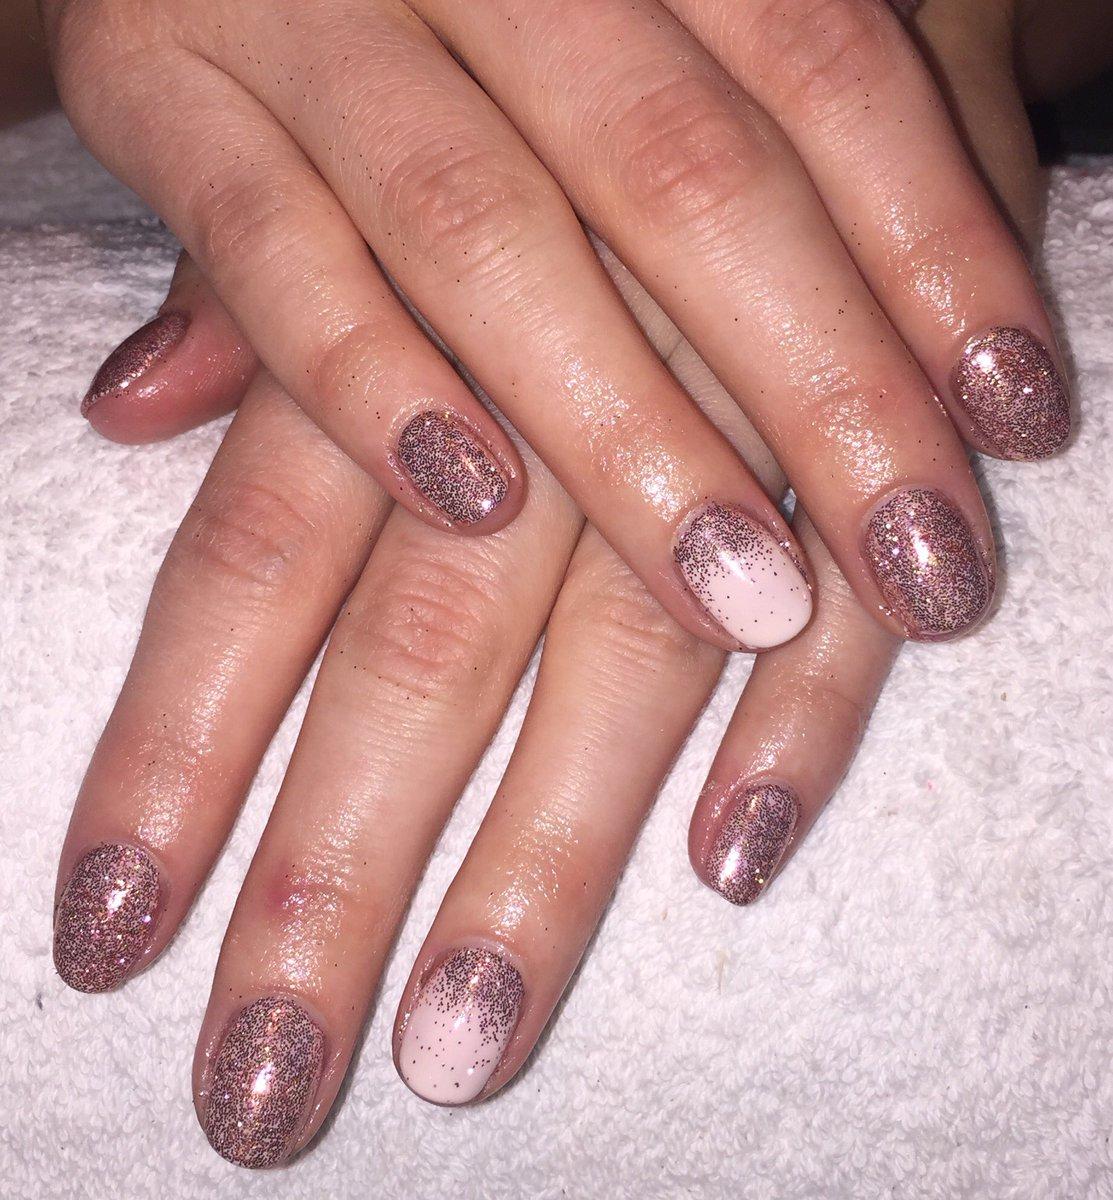 Hidden Beauty On Twitter We Ve Been Using Lots Of Our New Rose Gold Glitter Today Lecente Cnd Shellac Nails Rosegold Hiddenbeautyambleside